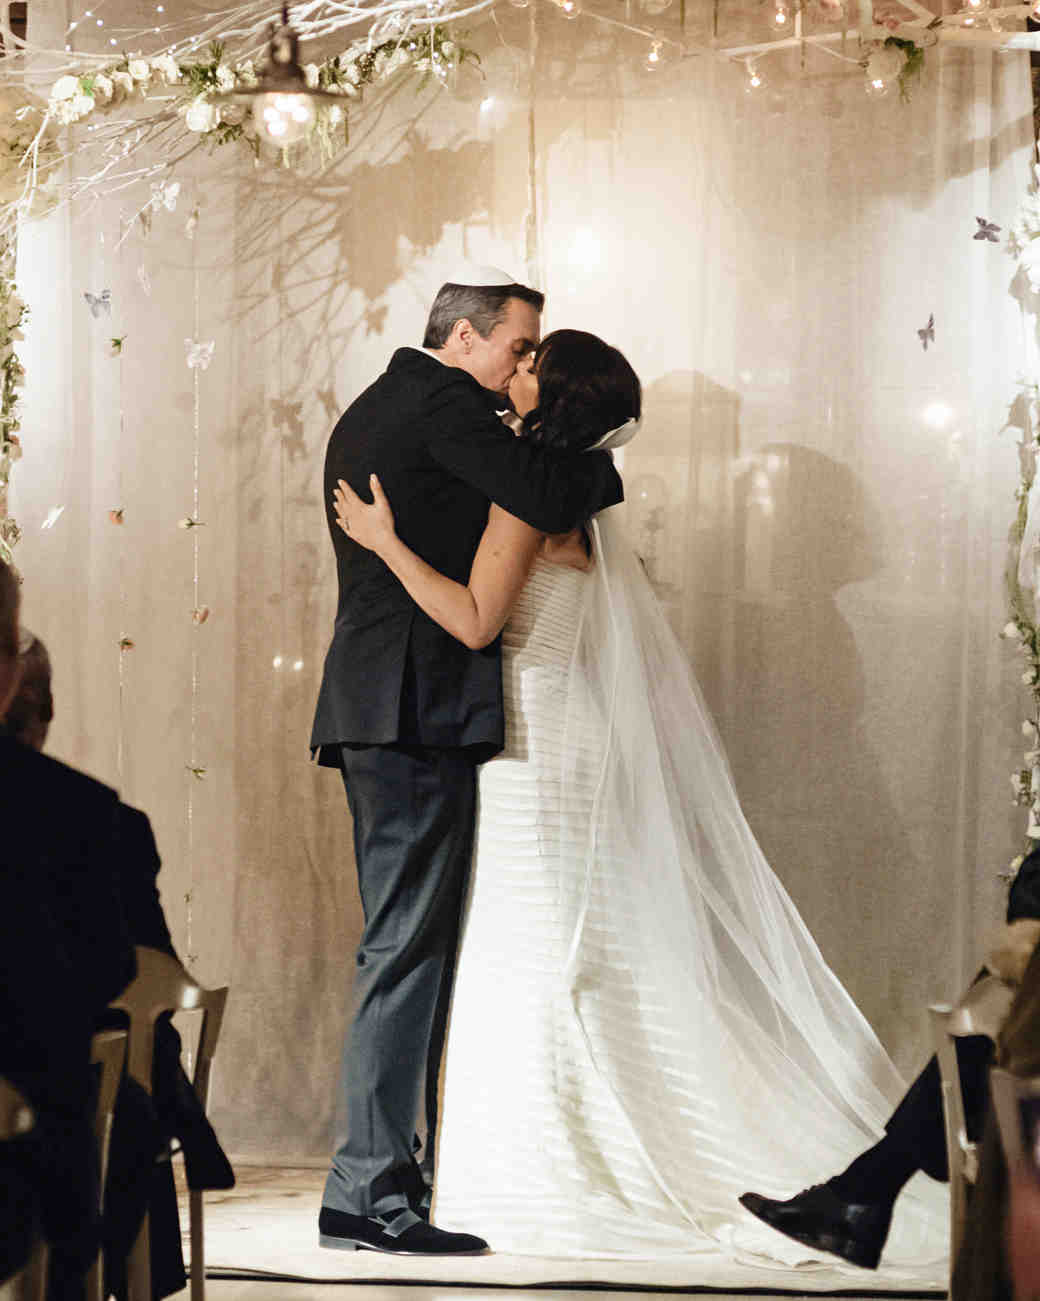 lori-jan-wedding-kiss-00599-s112305-1215.jpg